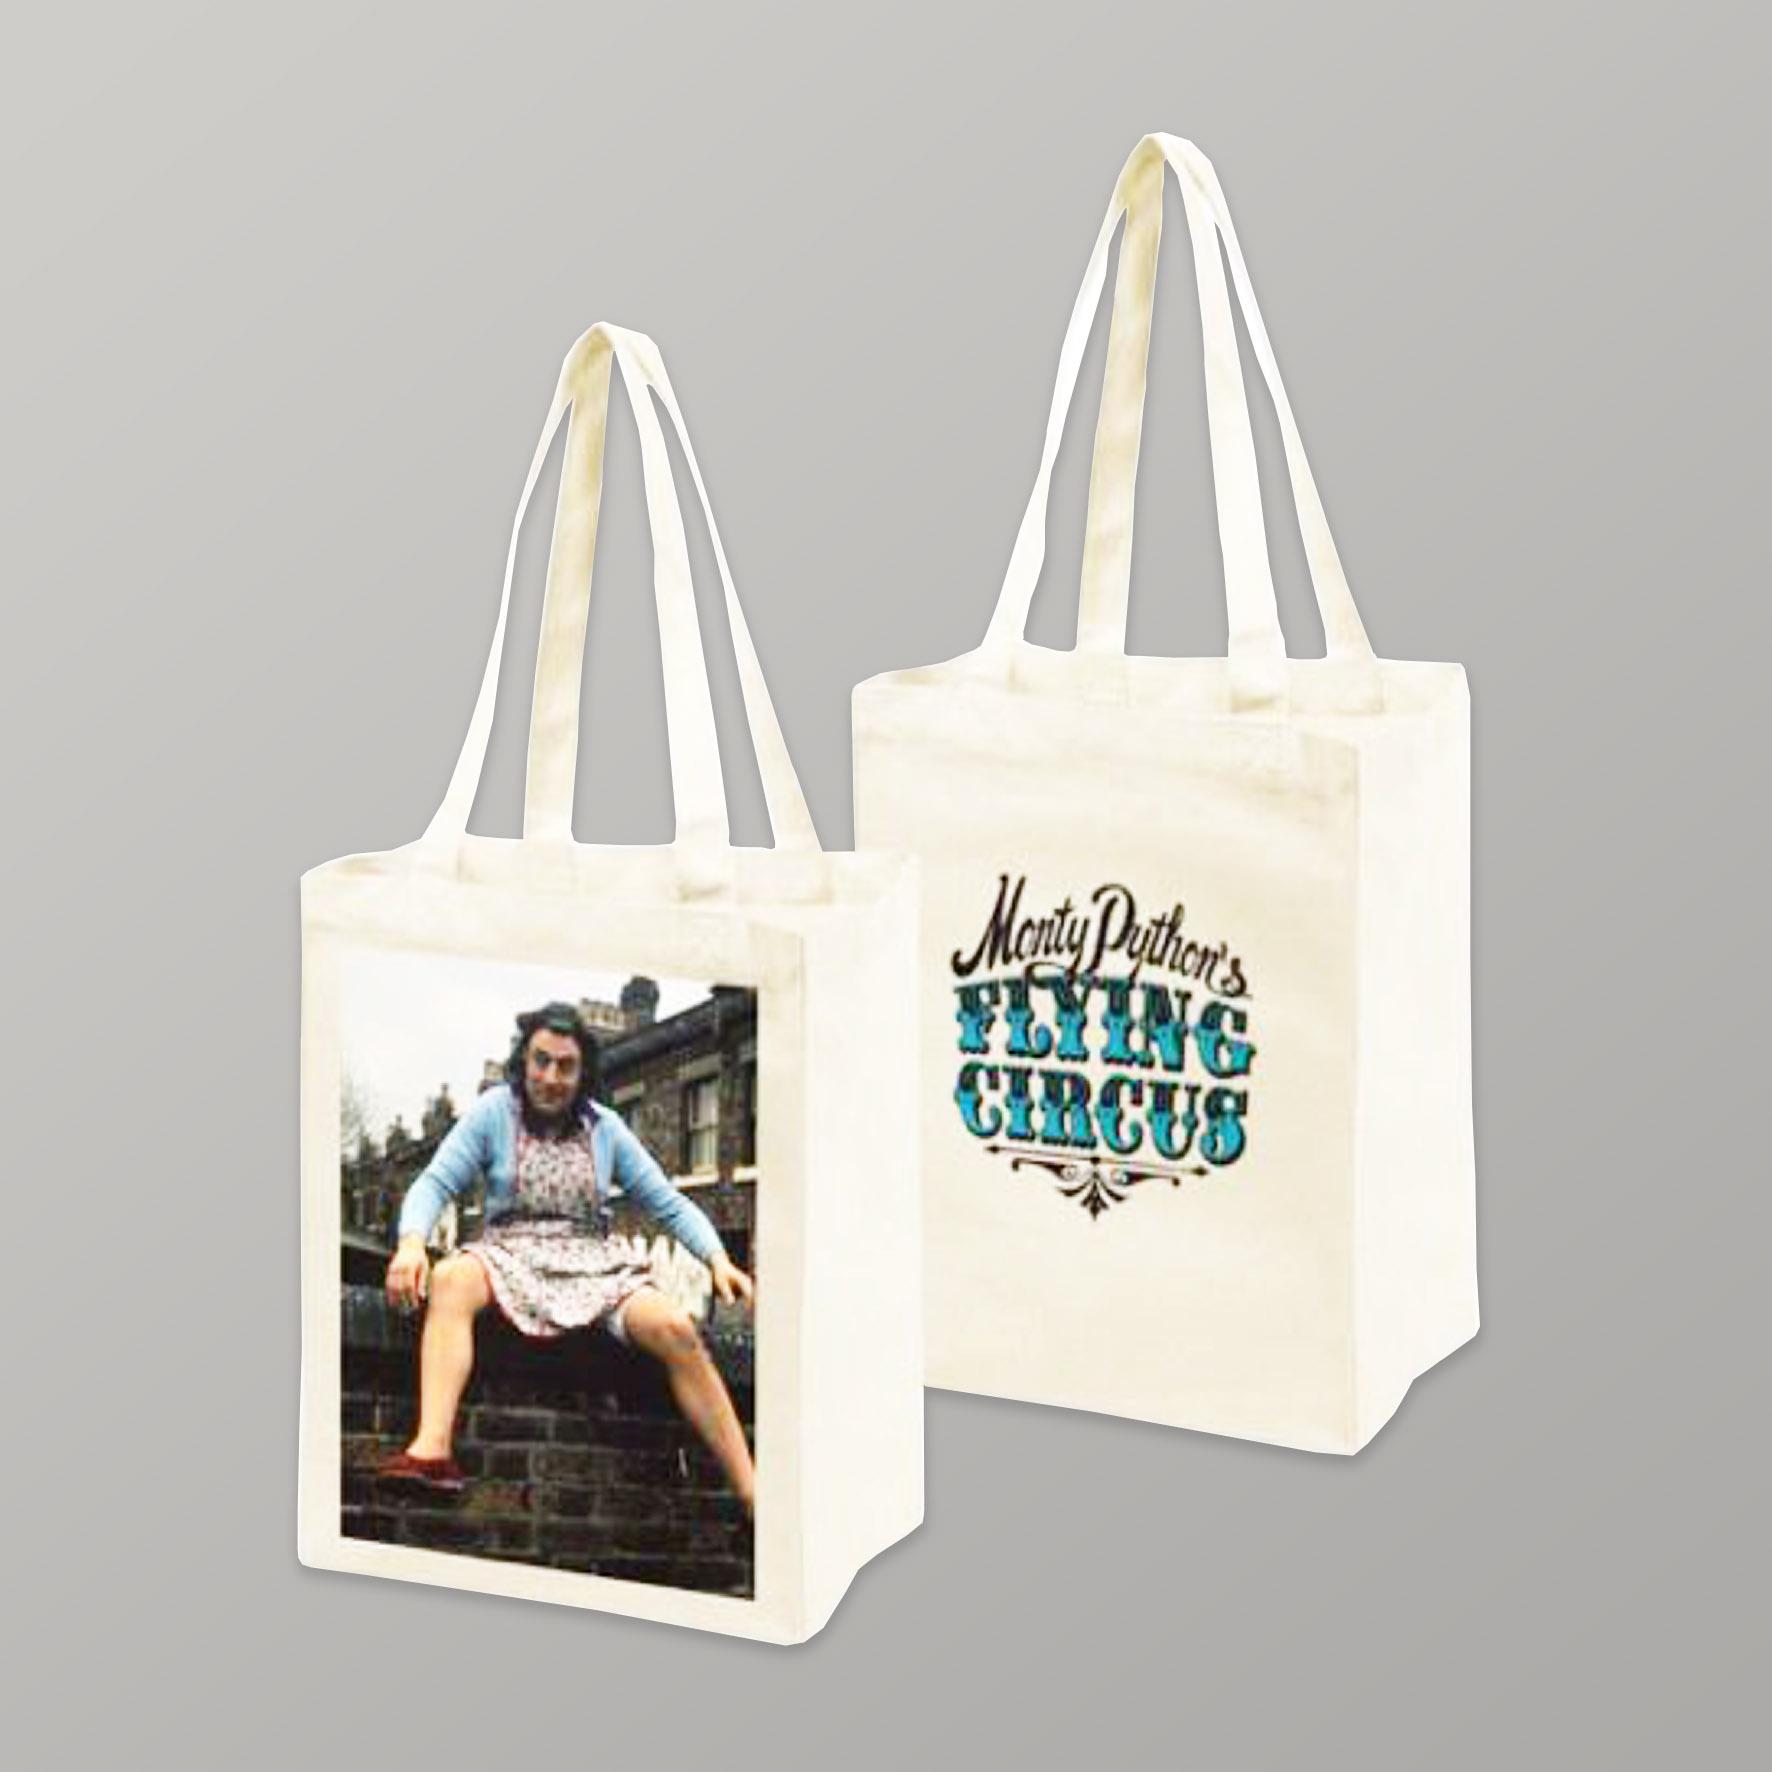 Buy Monty Python Tote Bag (Terry Jones)